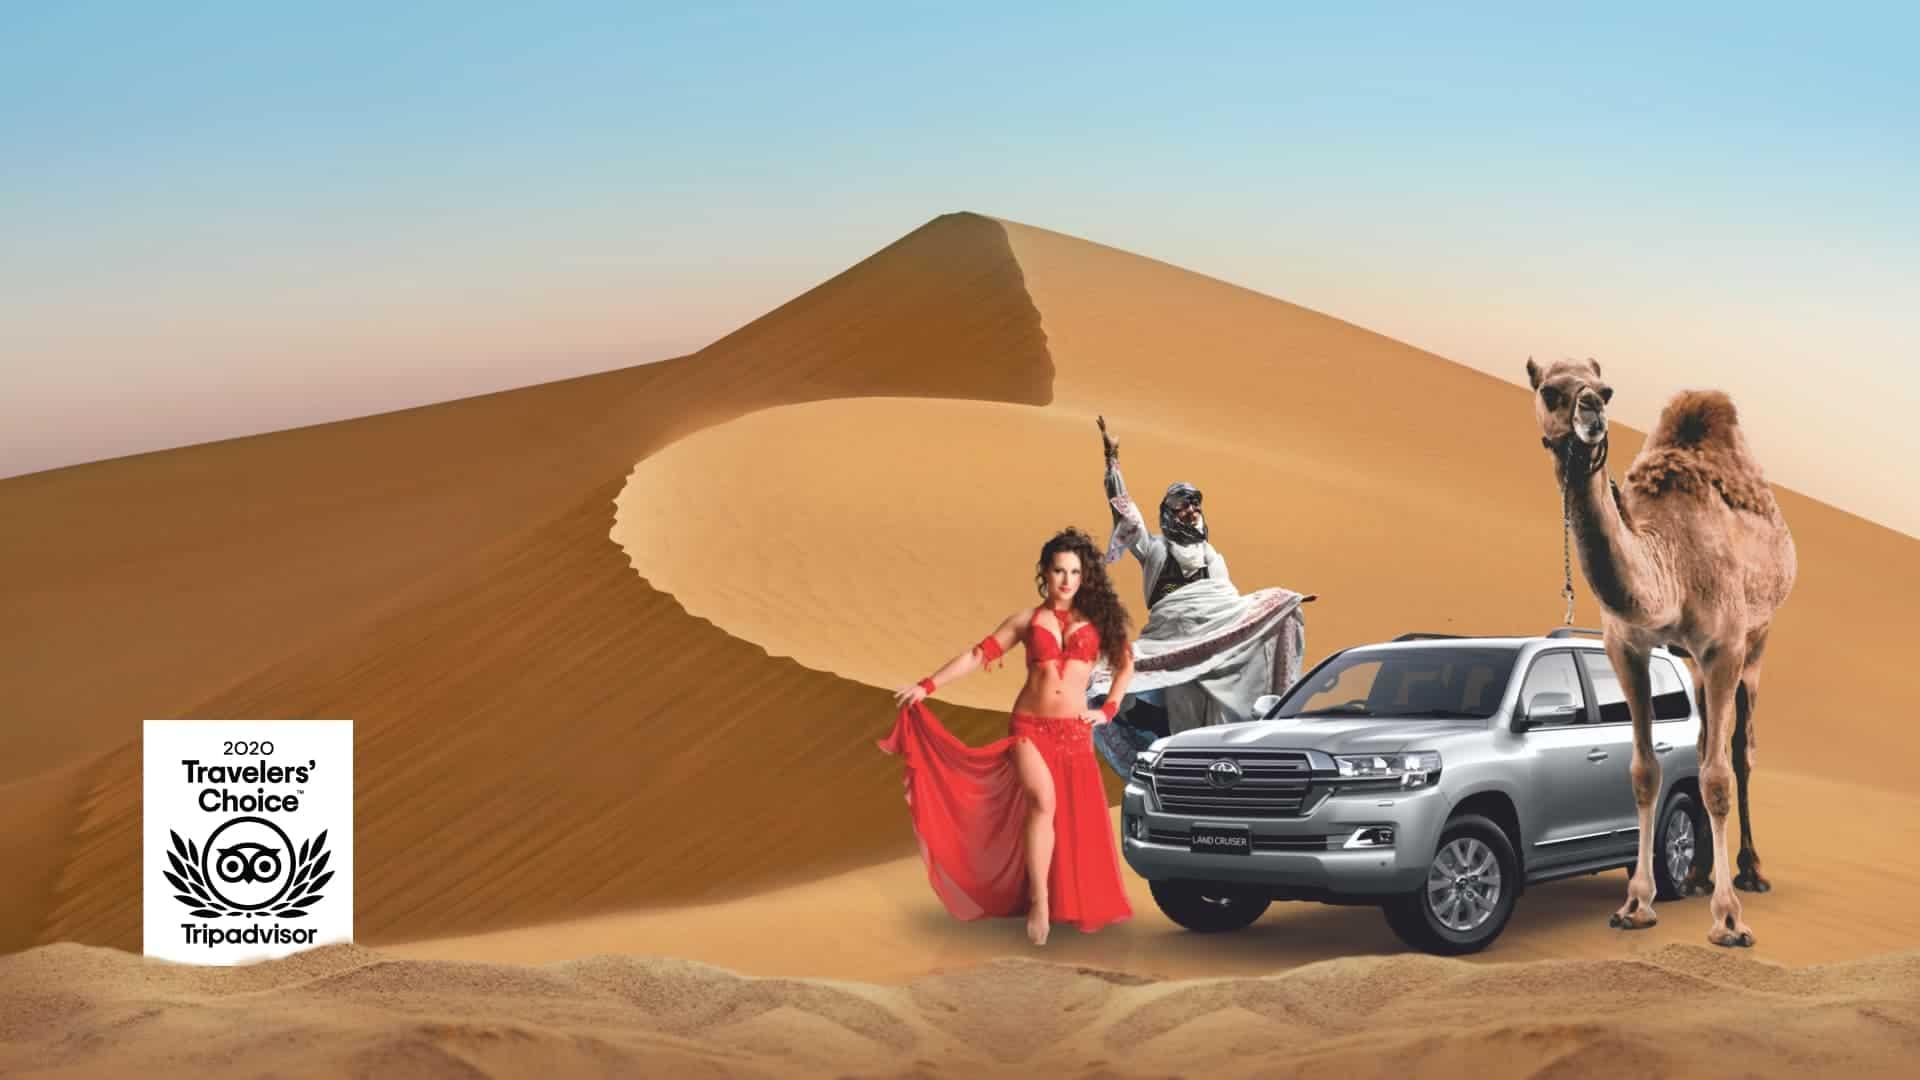 Dubai Provides Great Desert Safari Adventurism